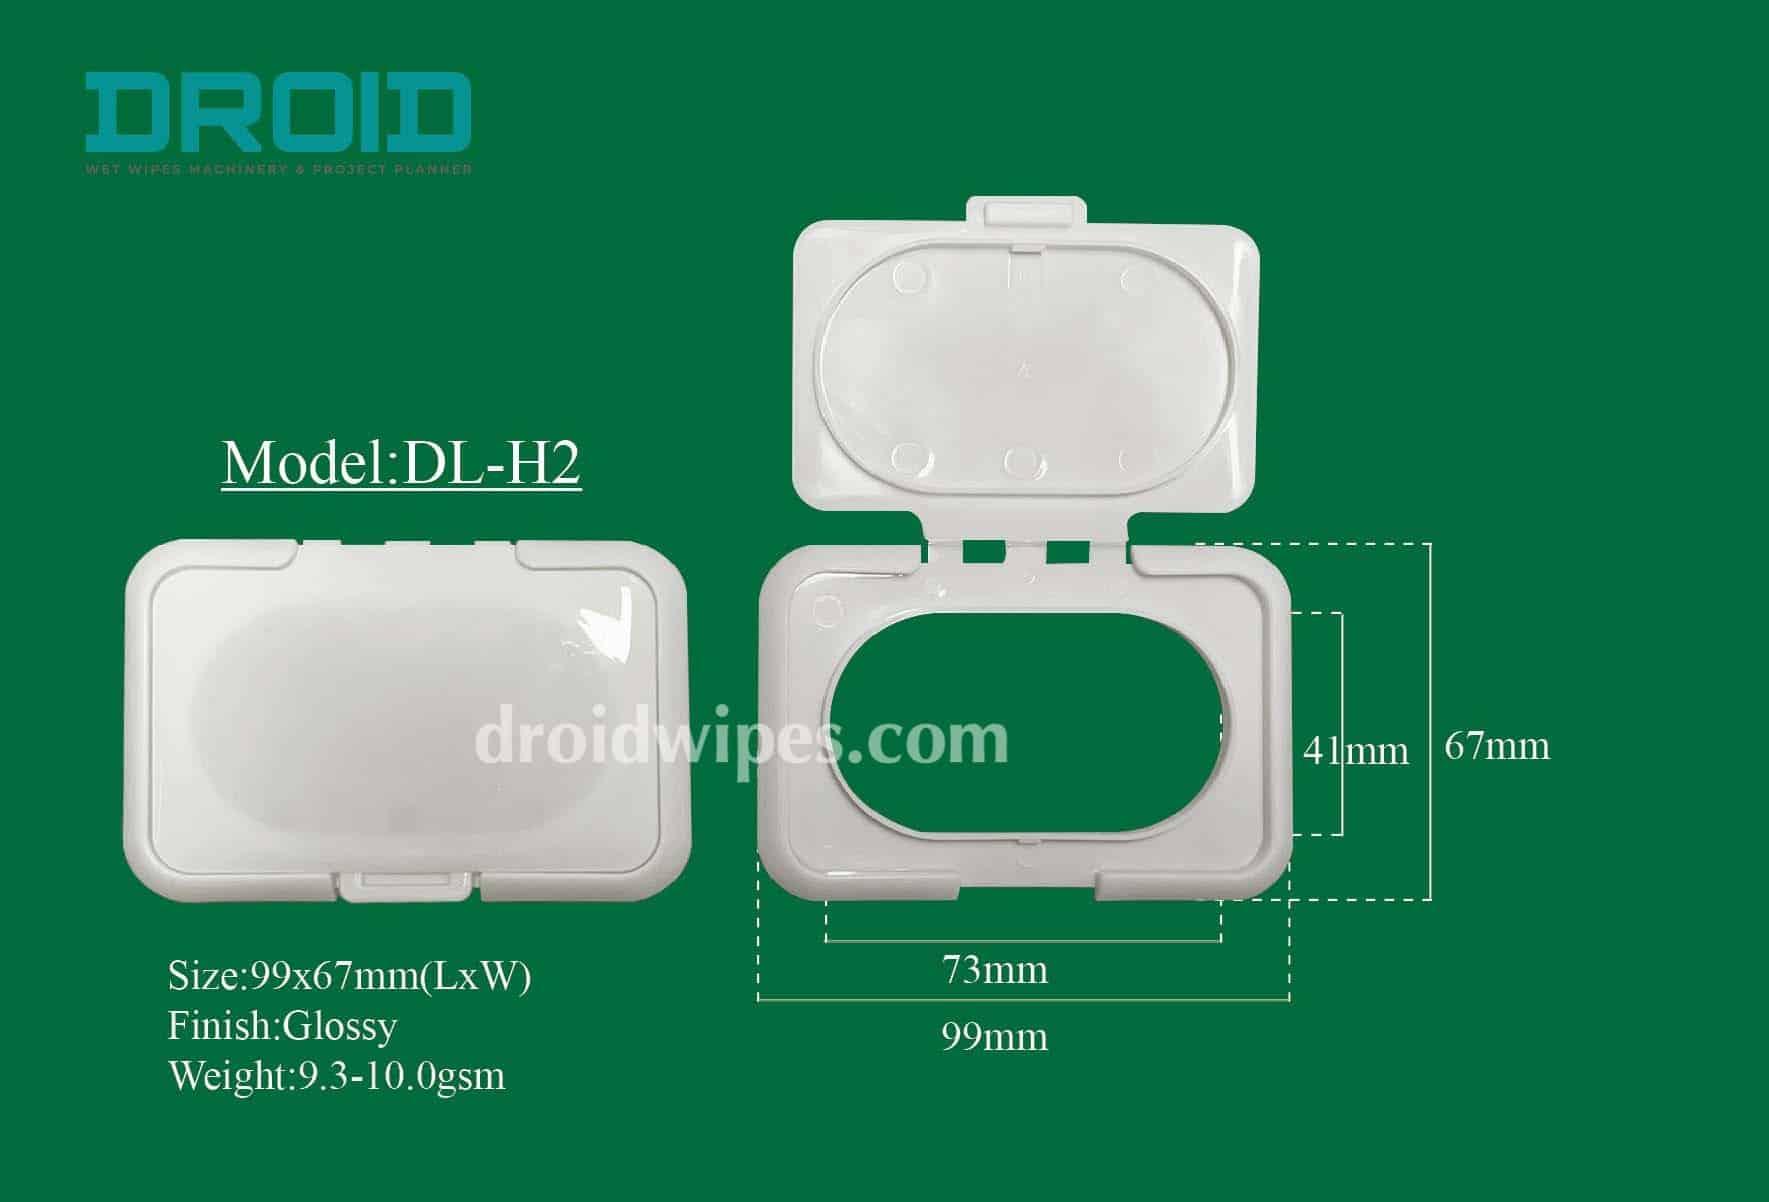 Plastic lid for wet wipes 1 - Plastic Lid for Wet Wipes